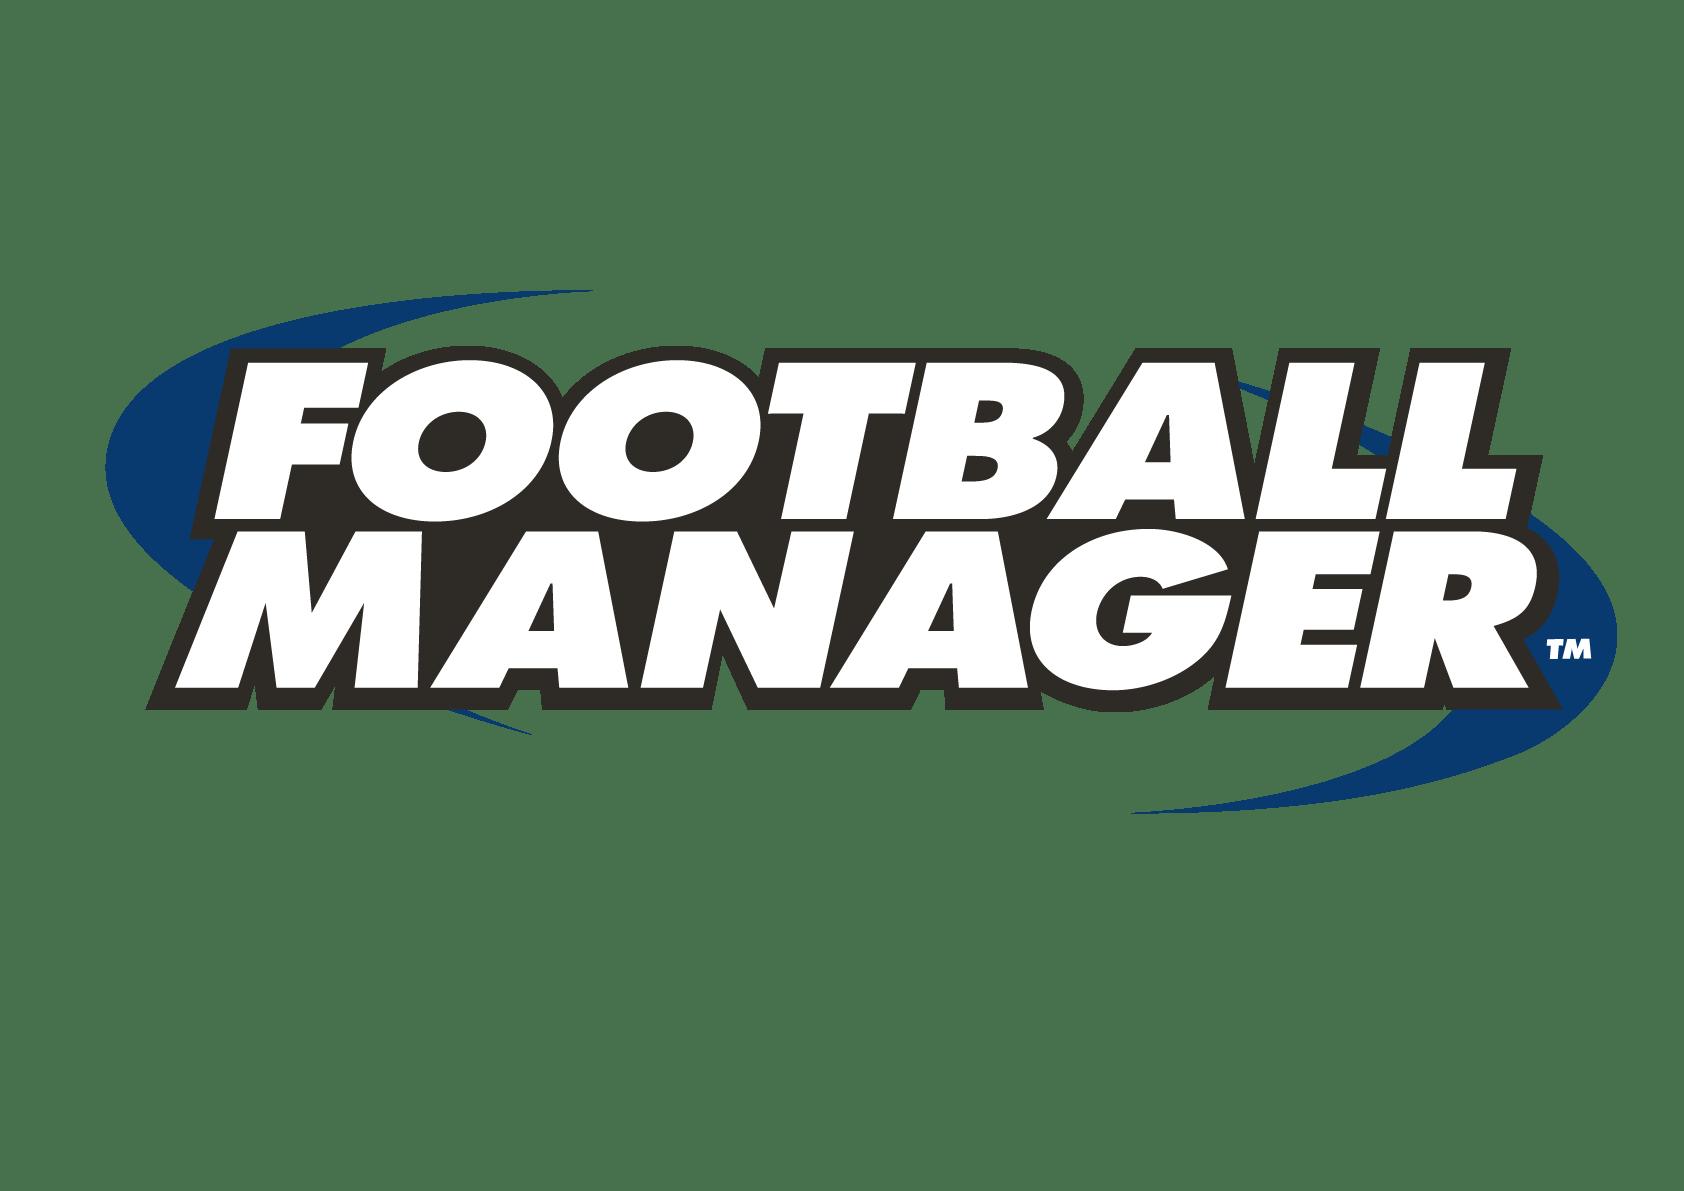 Football Manager 14 Logo1